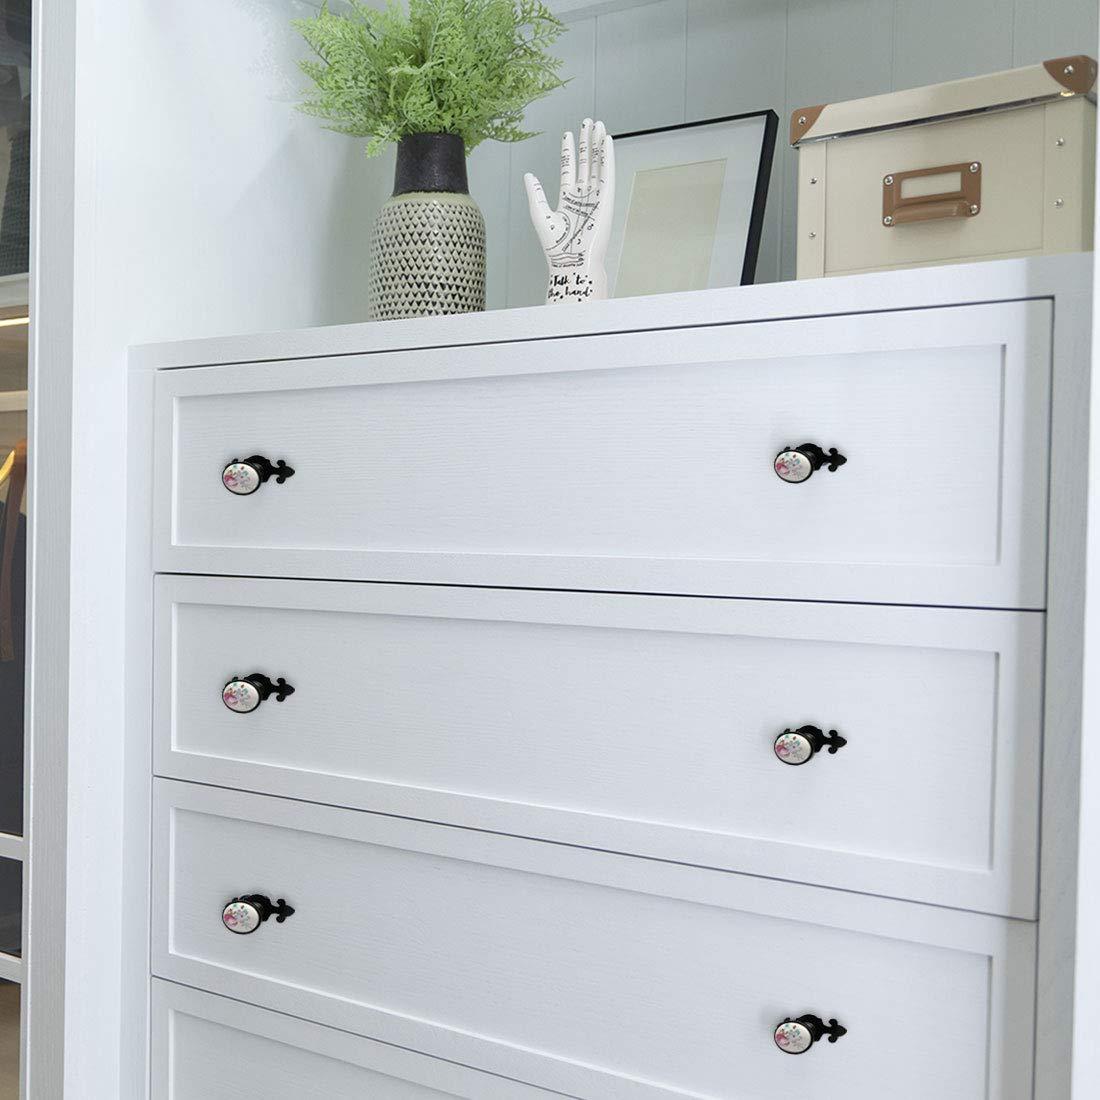 uxcell 4pcs Ceramic Knobs Vintage Knob Drawer Oval Shaped Pull Handle Furniture Door Cabinet Cupboard Wardrobe Dresser Decoration #2